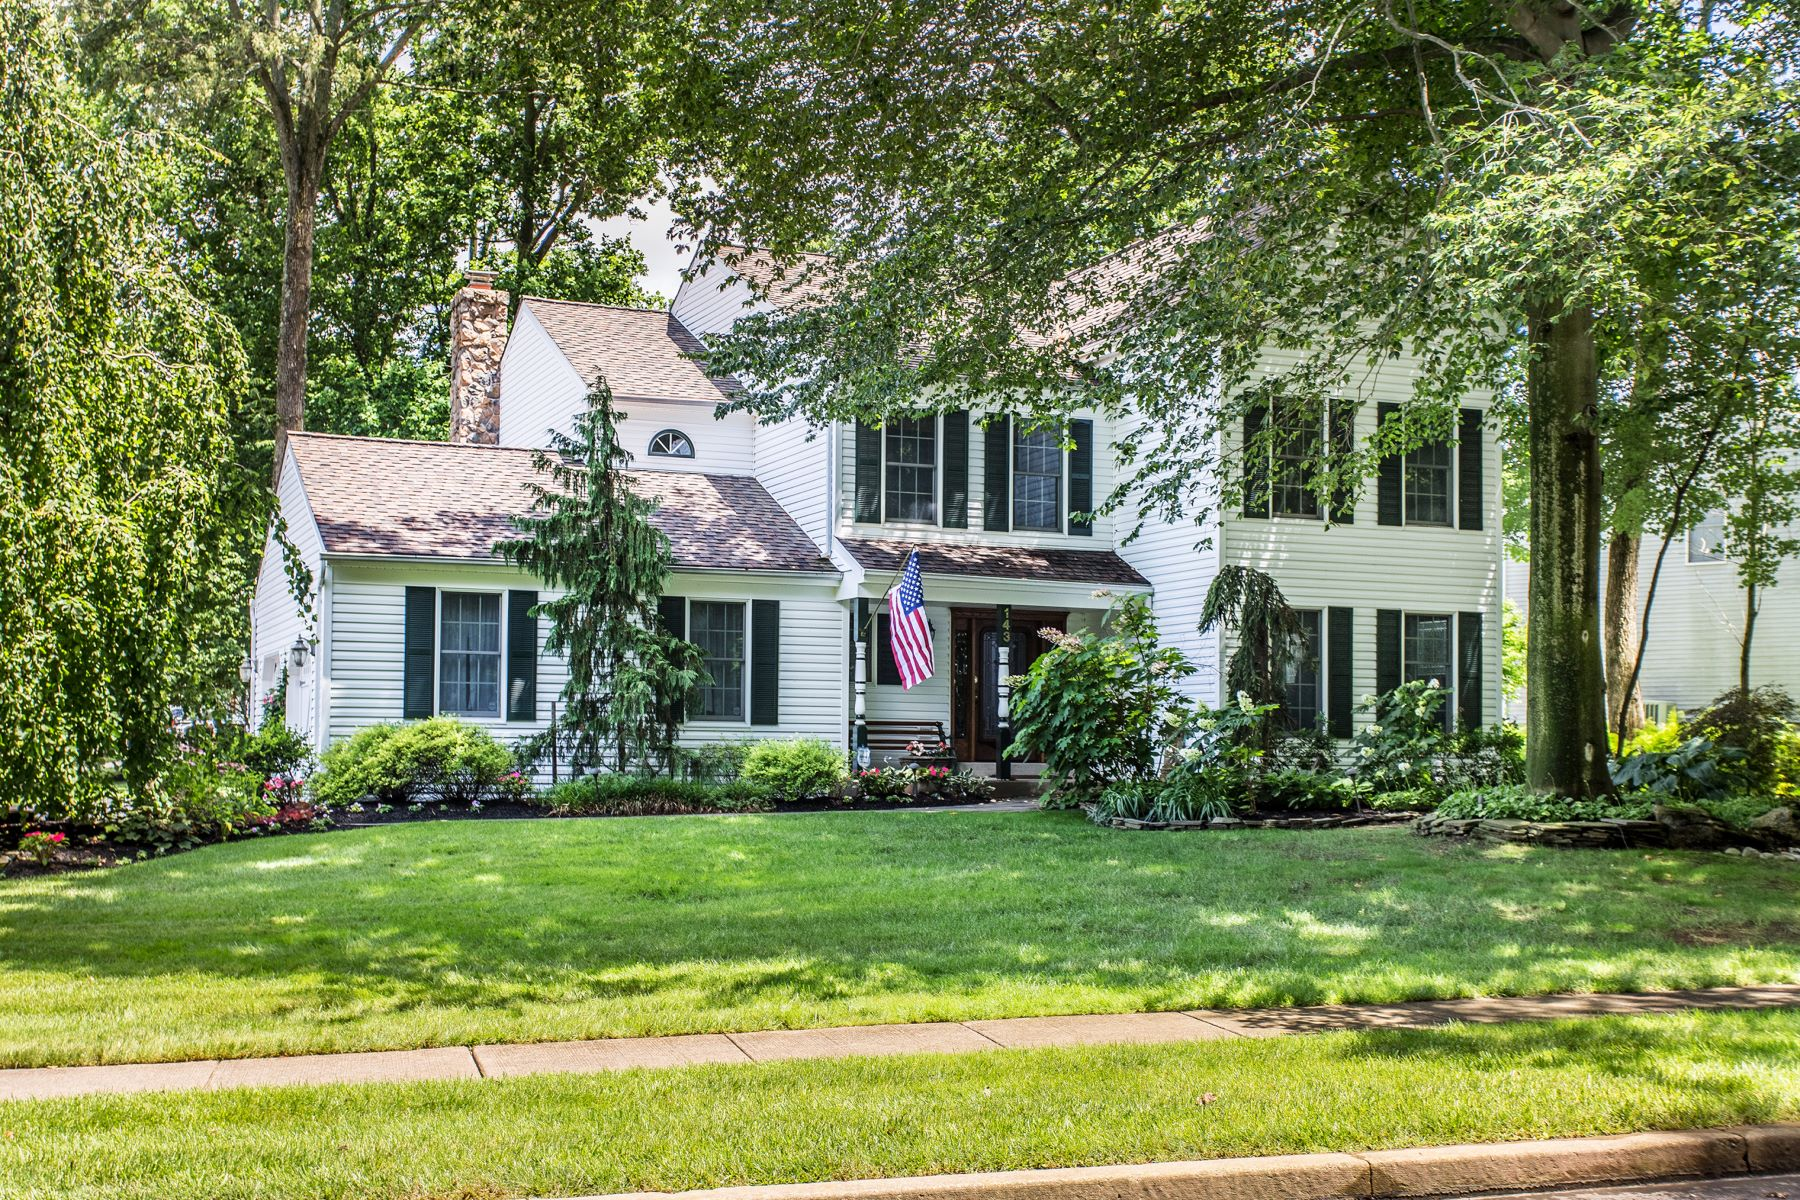 واحد منزل الأسرة للـ Sale في 143 Claremont Dr Lansdale, Pennsylvania, 19446 United States